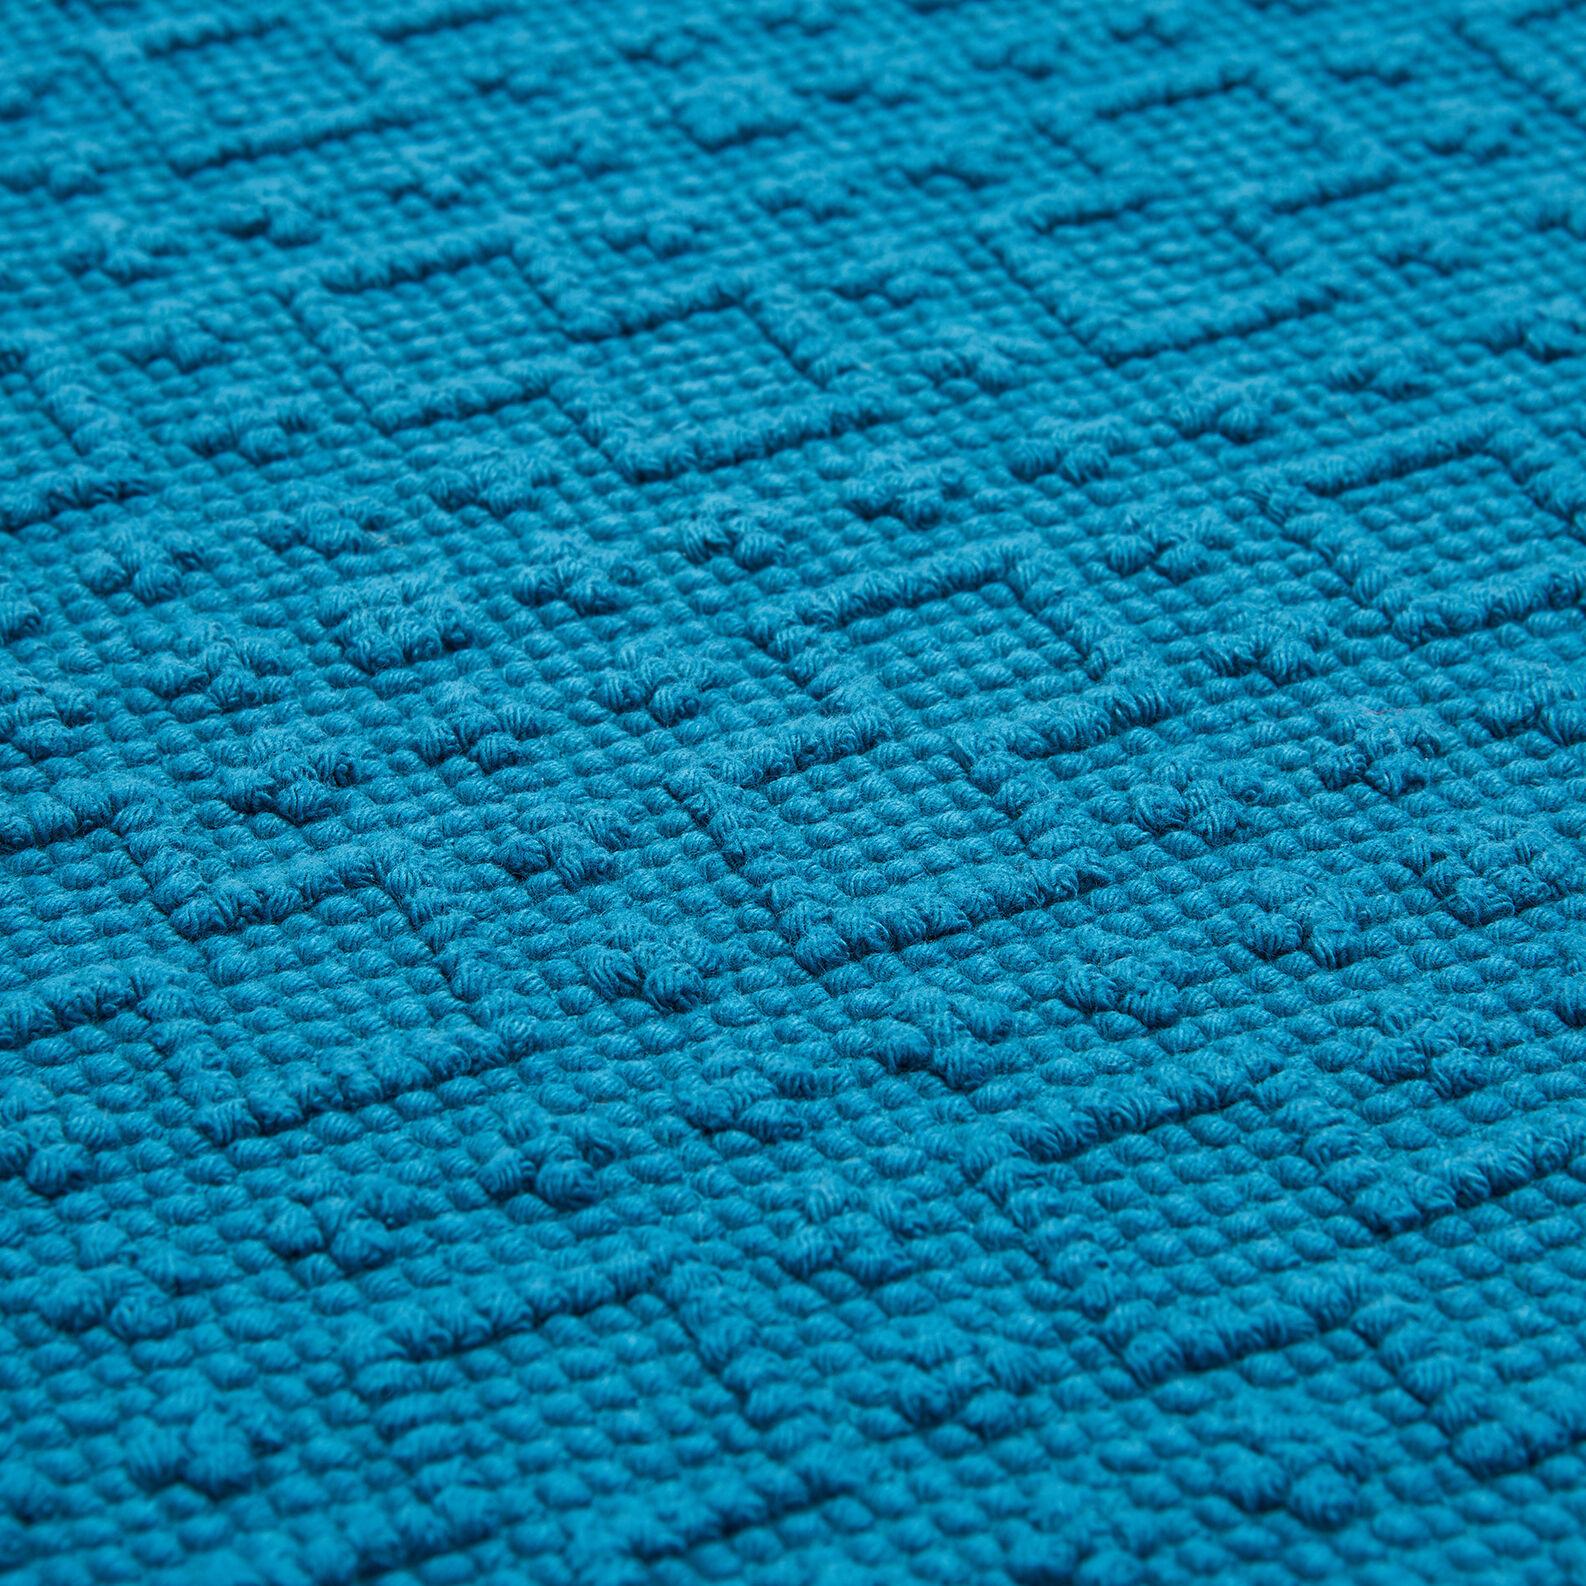 100% cotton bath mat with geometric design